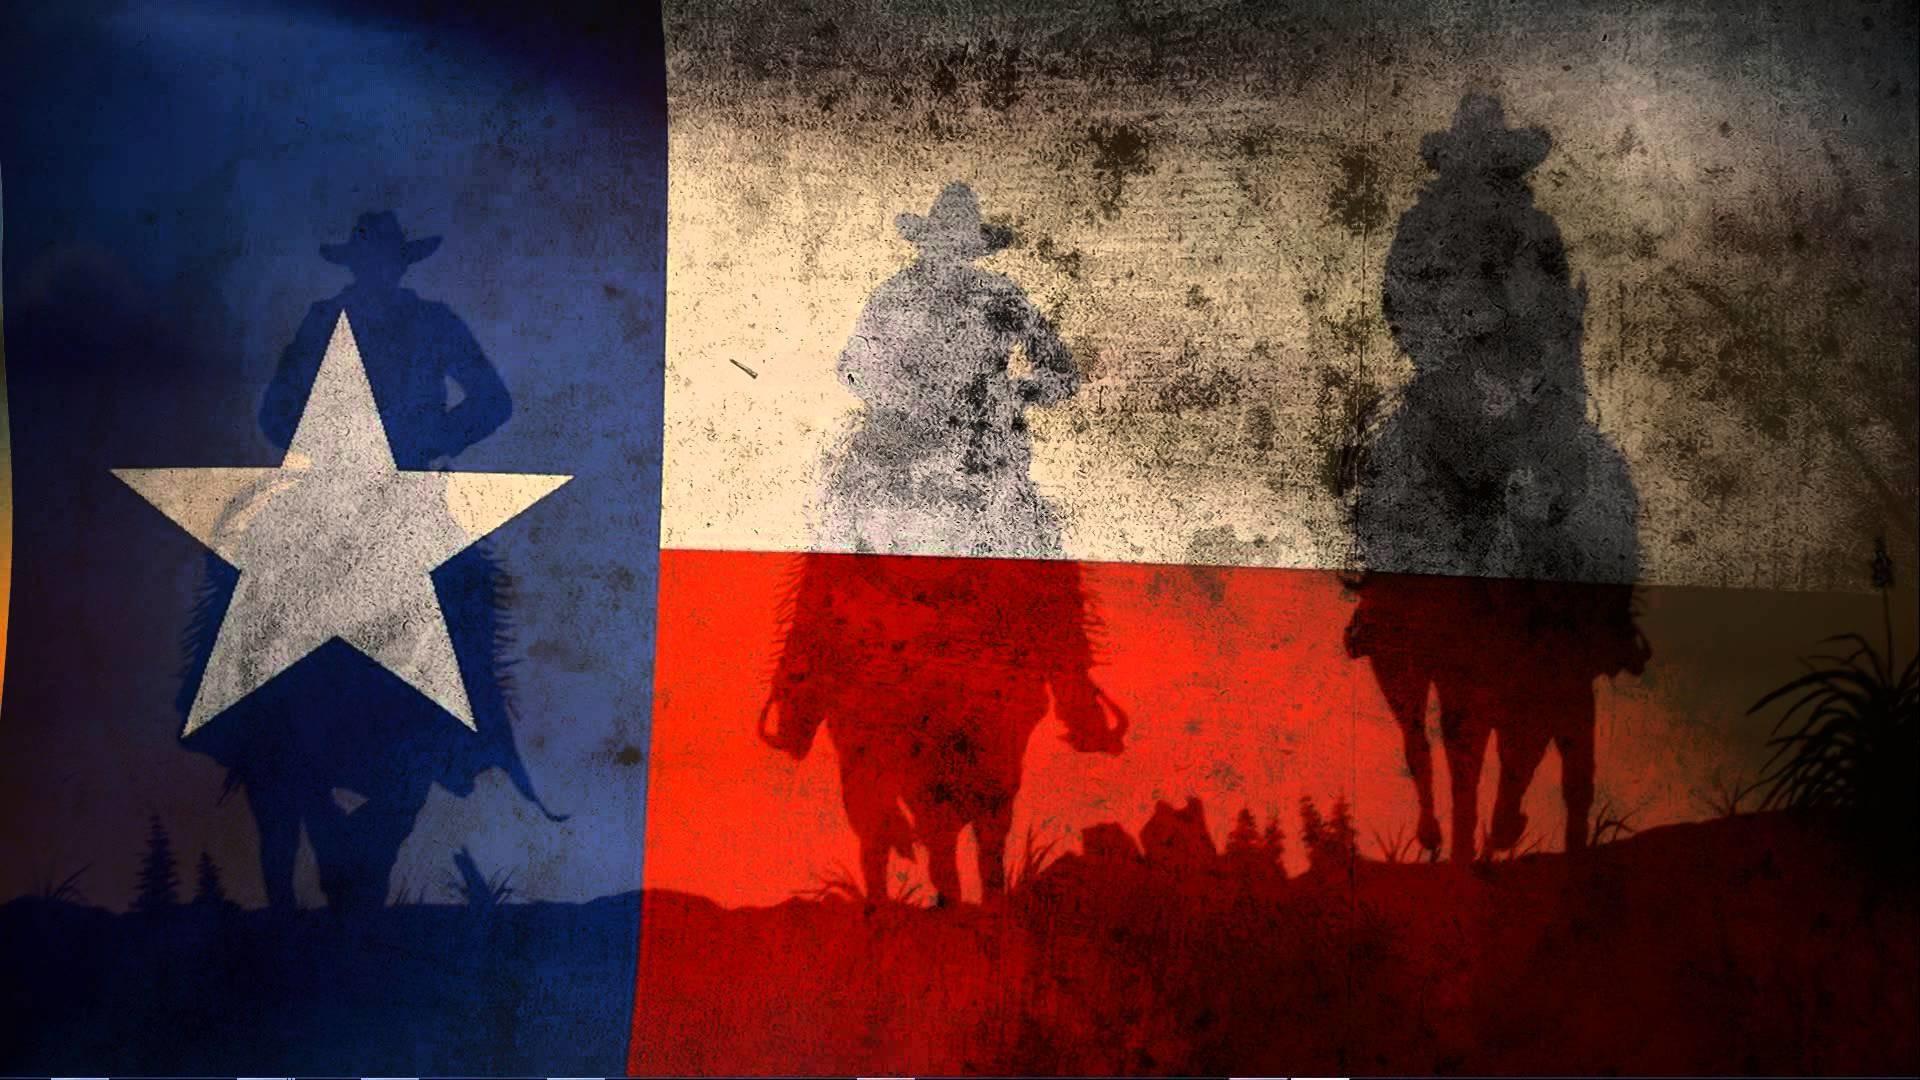 Texas flag & Yellow Rose of Texas/Eyes of Texas by Elvis Presley